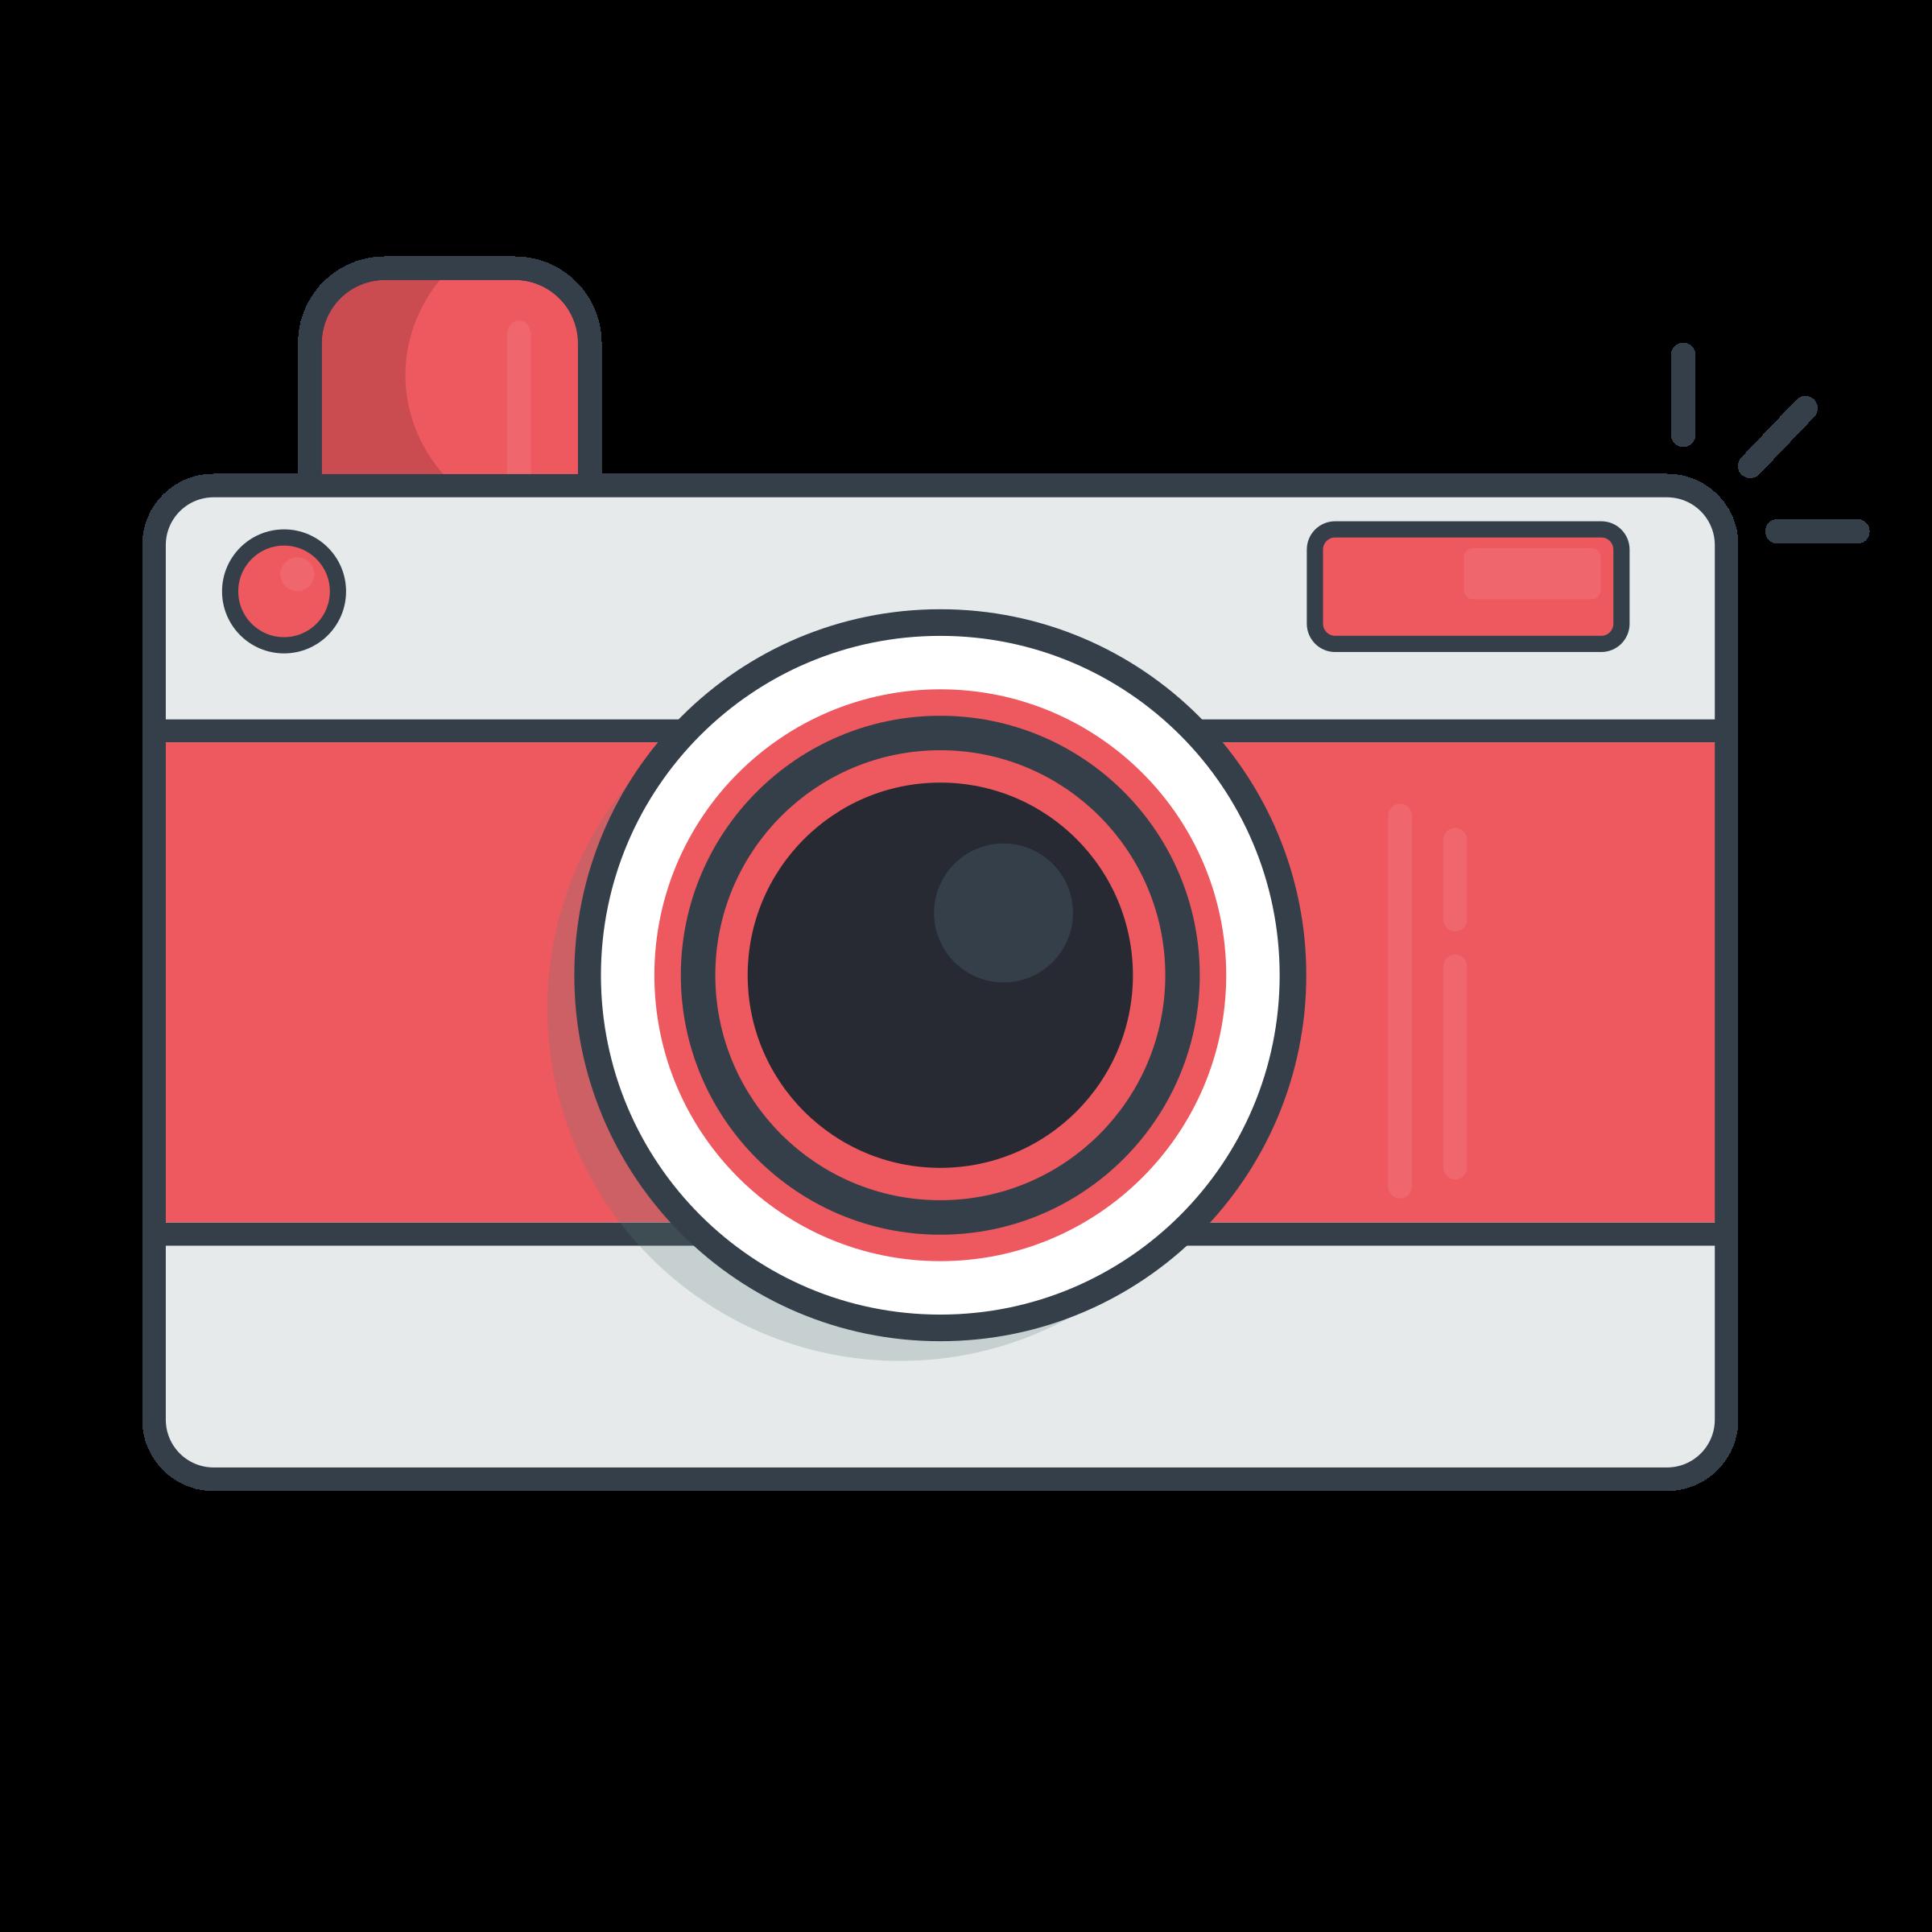 clip free stock Camera clipart. Kamera big image png